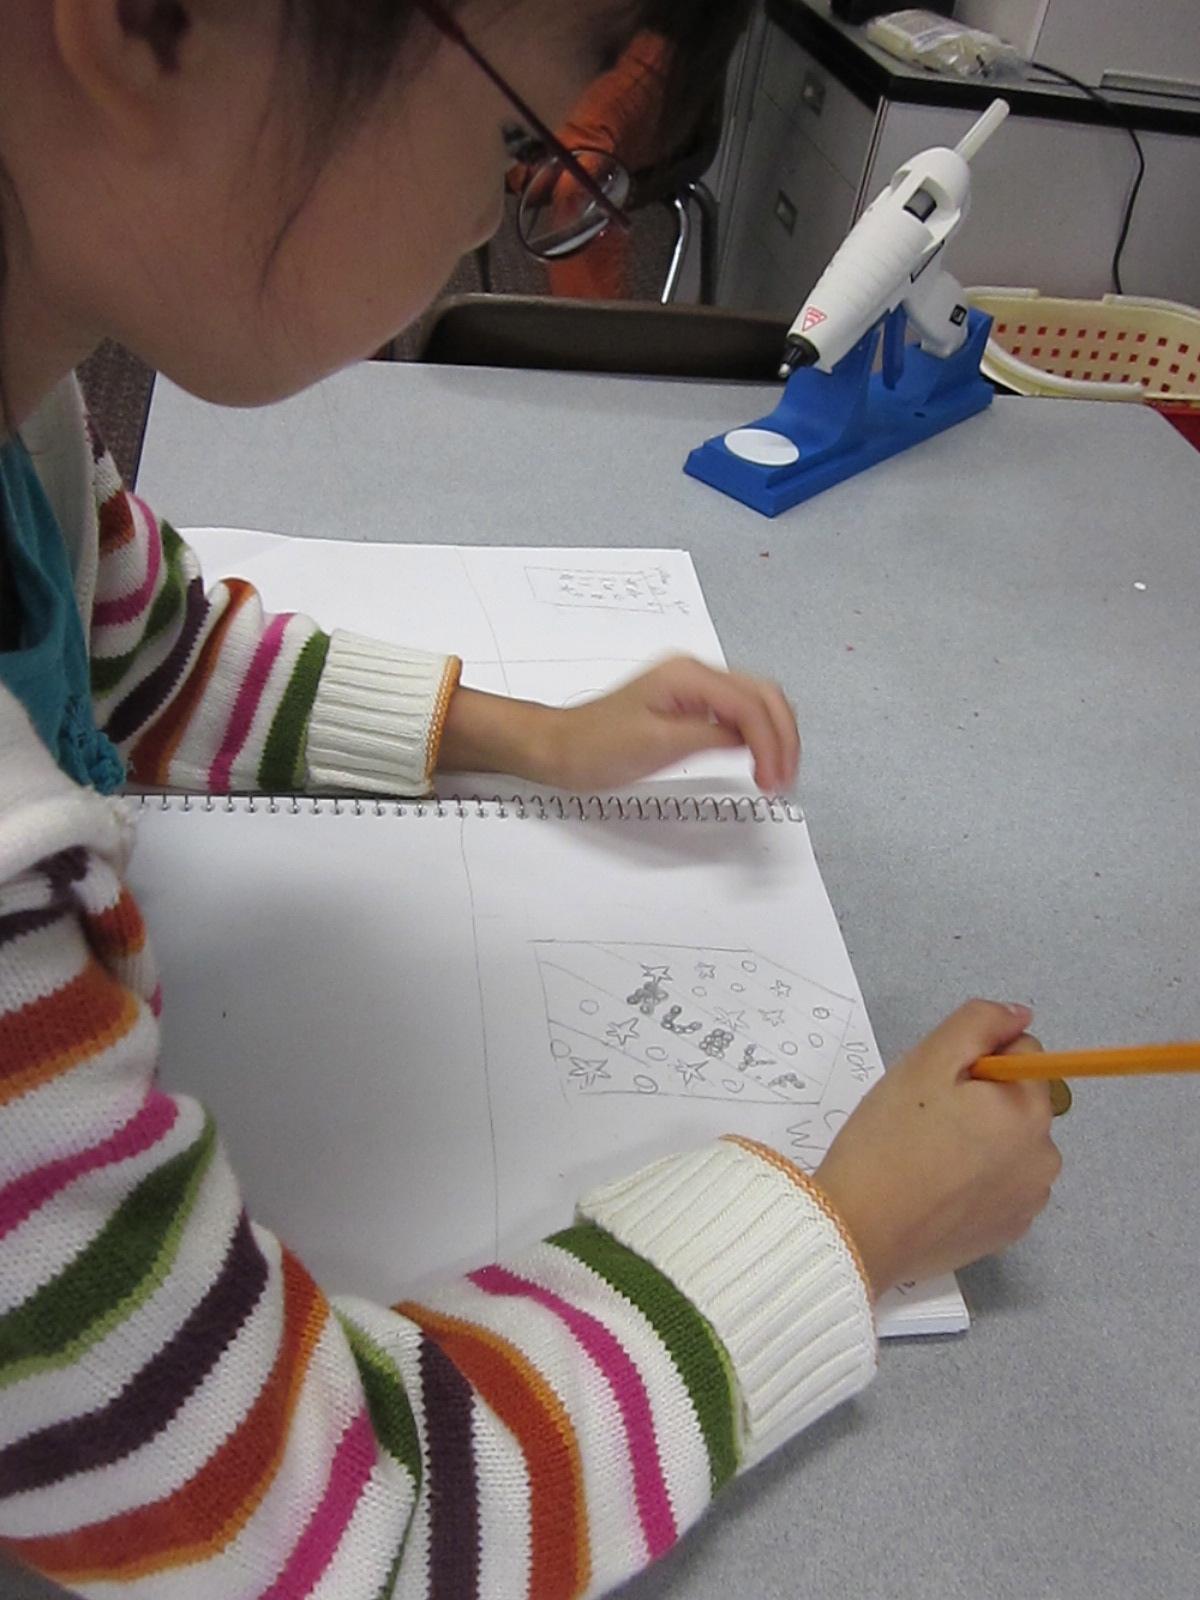 Students evolved sketch prototypes based on feedback.